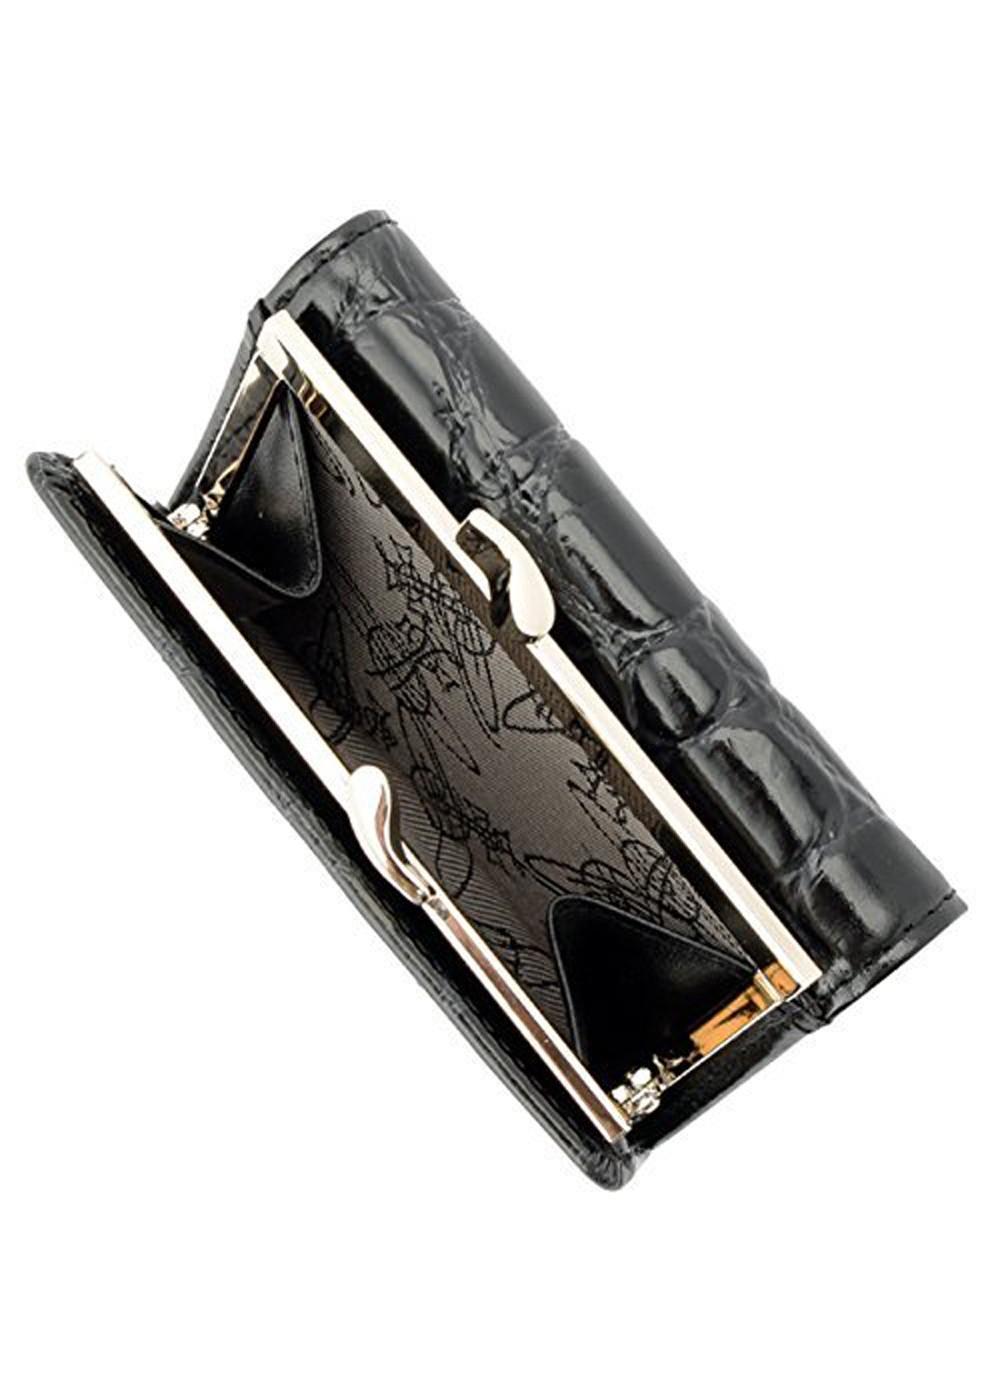 dc2ac2d19cba ヴィヴィアン・ウエストウッド Vivienne Westwood 財布 三つ折り 51010018-40249 BLACK 金具ゴールド ...